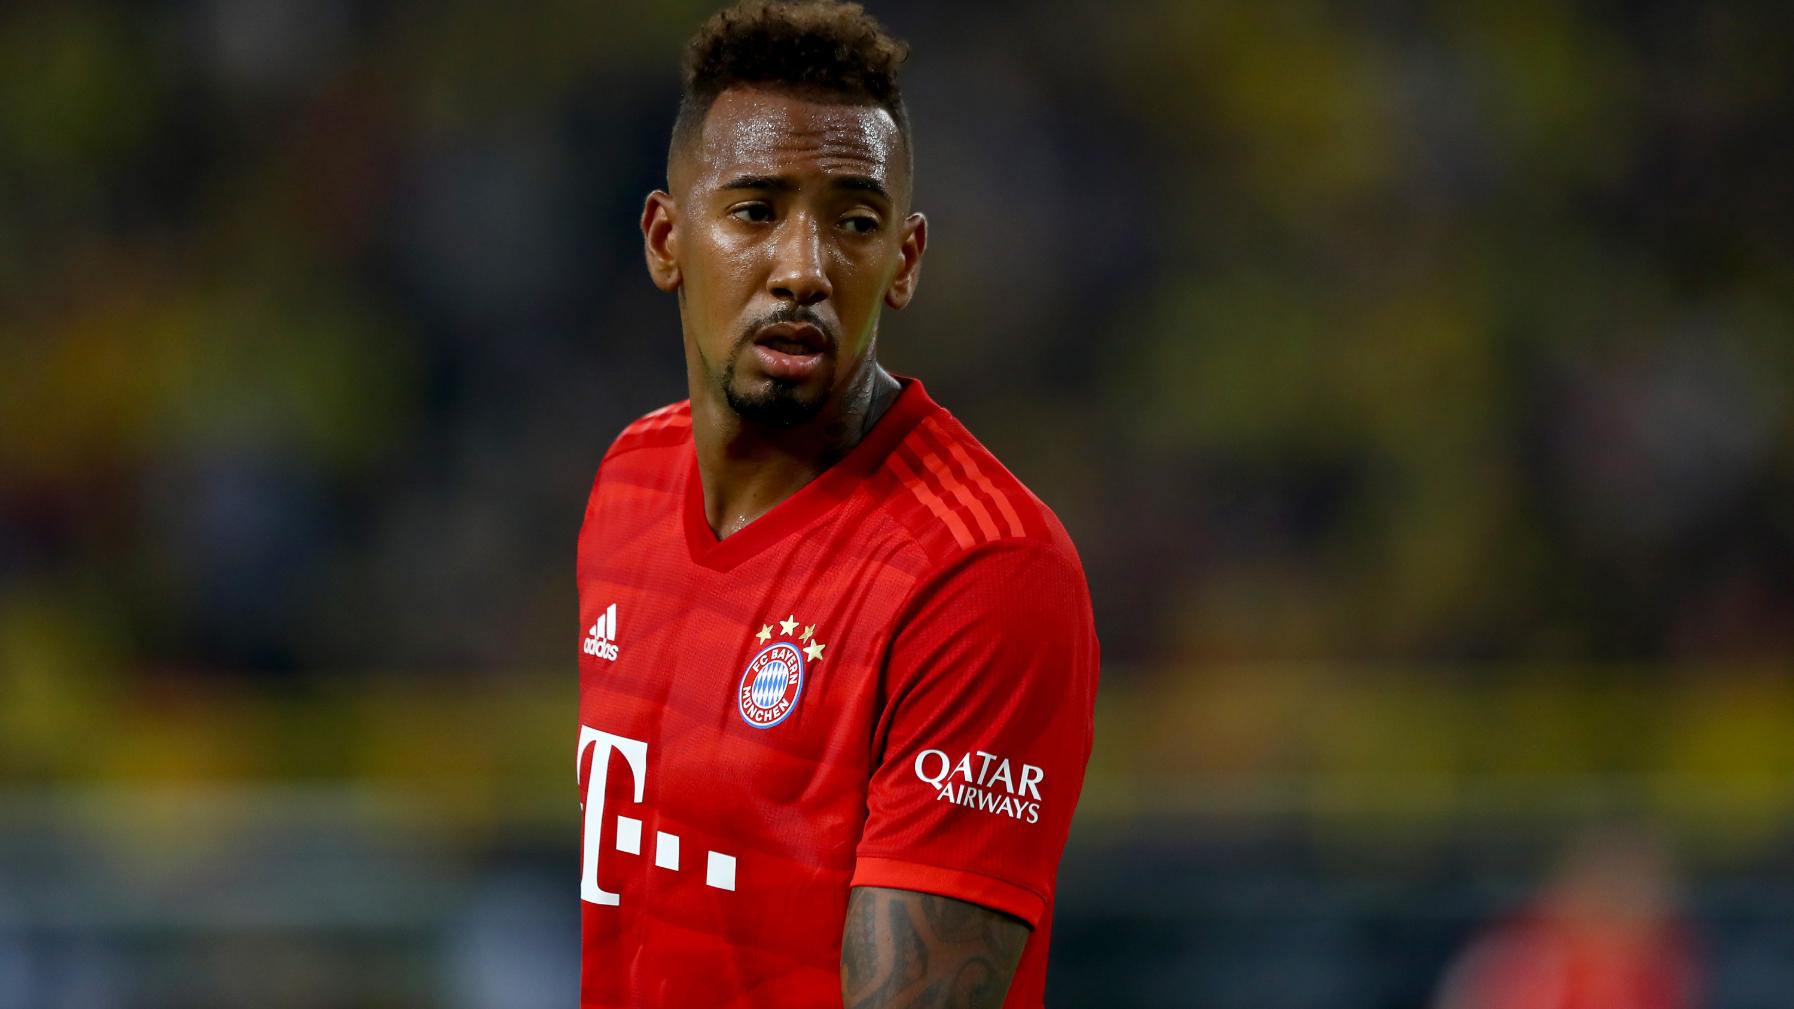 Bayern Munich - Jerome Boateng est heureux et s'imagine rester